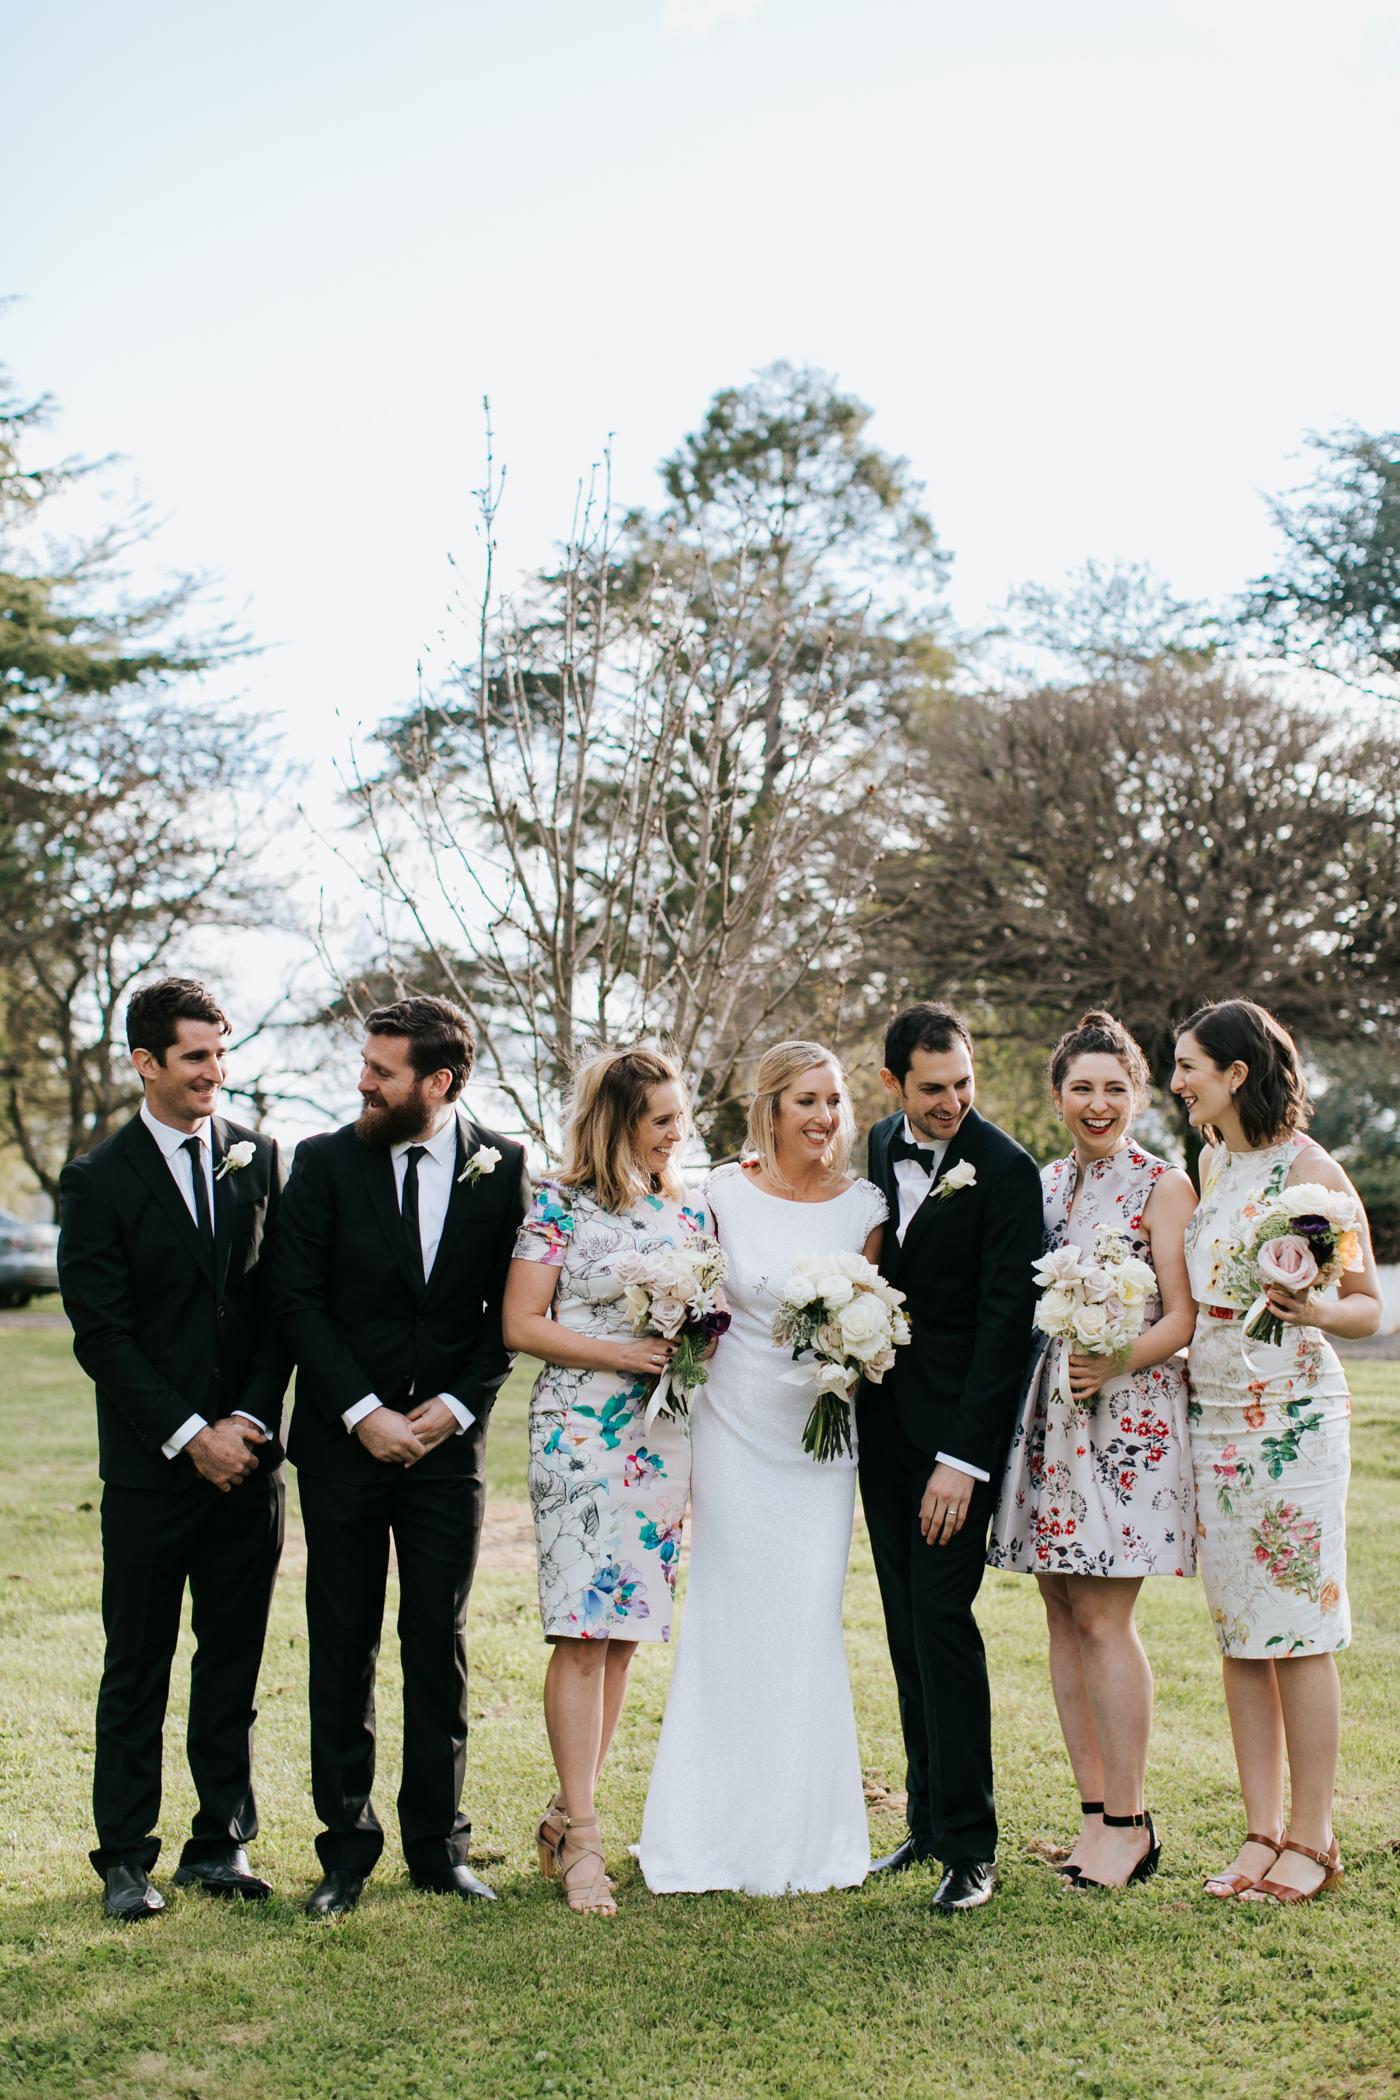 Bridget & James - Orange Country Wedding - Samantha Heather Photography-100.jpg